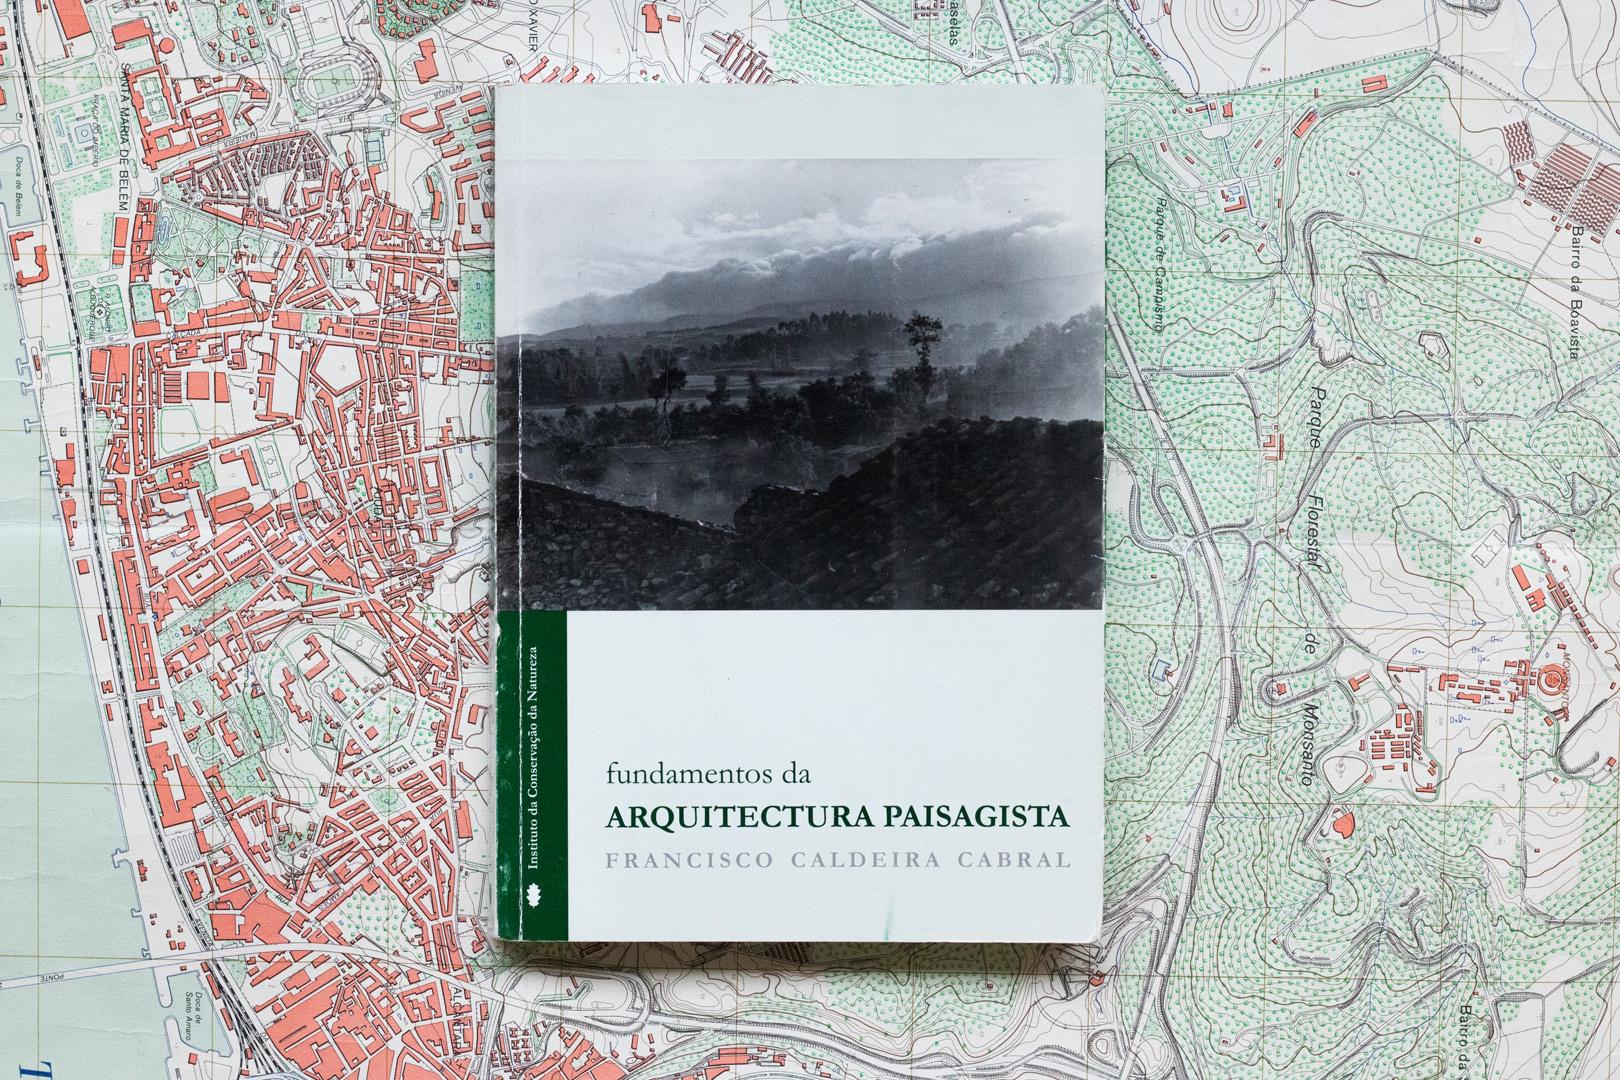 Fundamentos da Arquitetura Paisagista